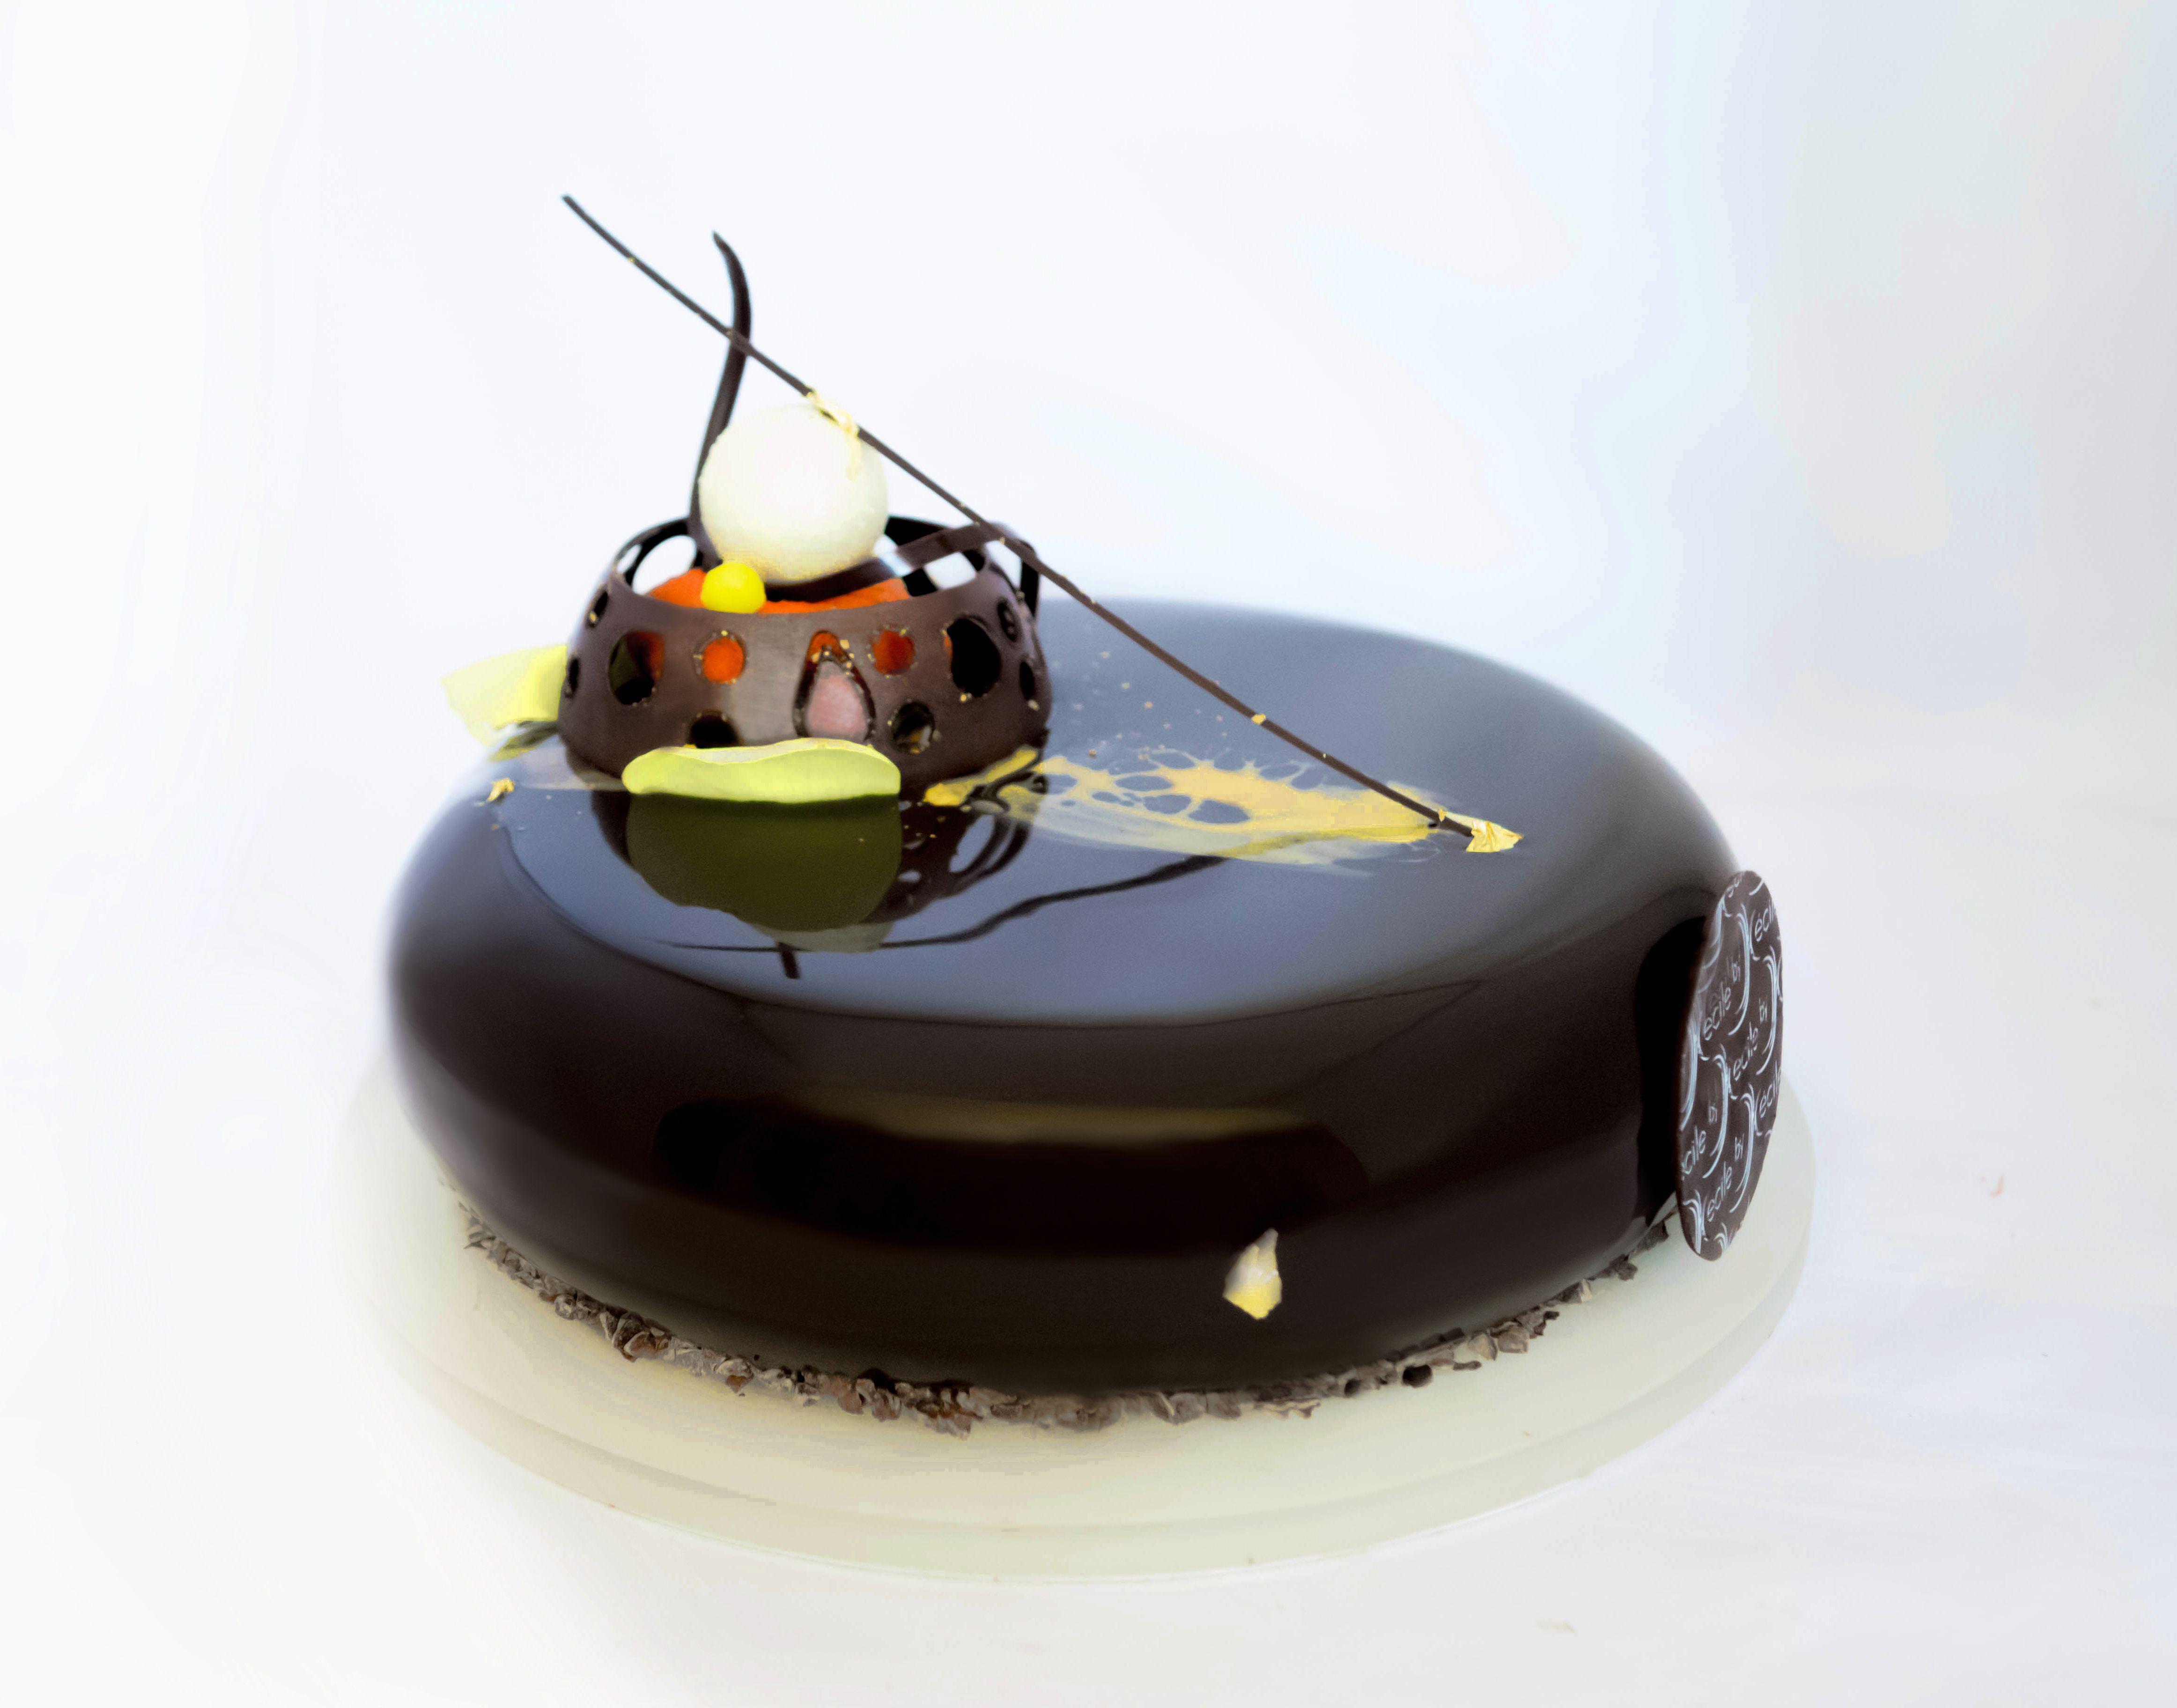 Entremets Chocolat Orange Streusel Chocolat Noisette Biscuit Chocolat Marmelade D Orange Cremeux Chocolat La Desserts Baking And Pastry Chocolate Garnishes